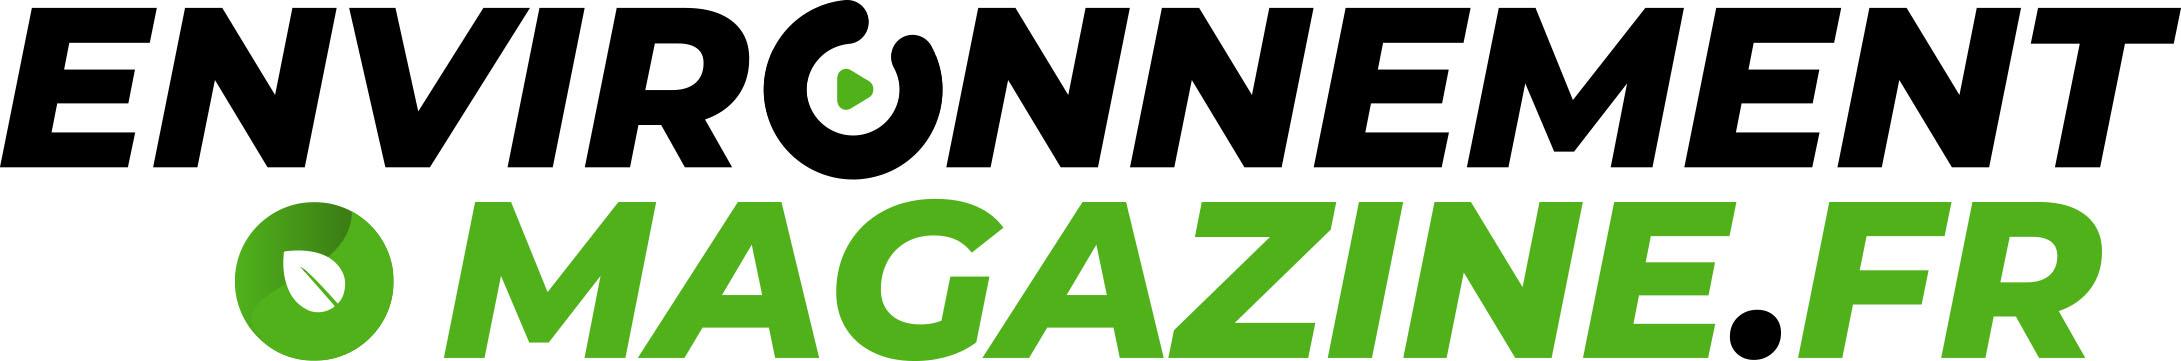 logo : Environnement Magazine